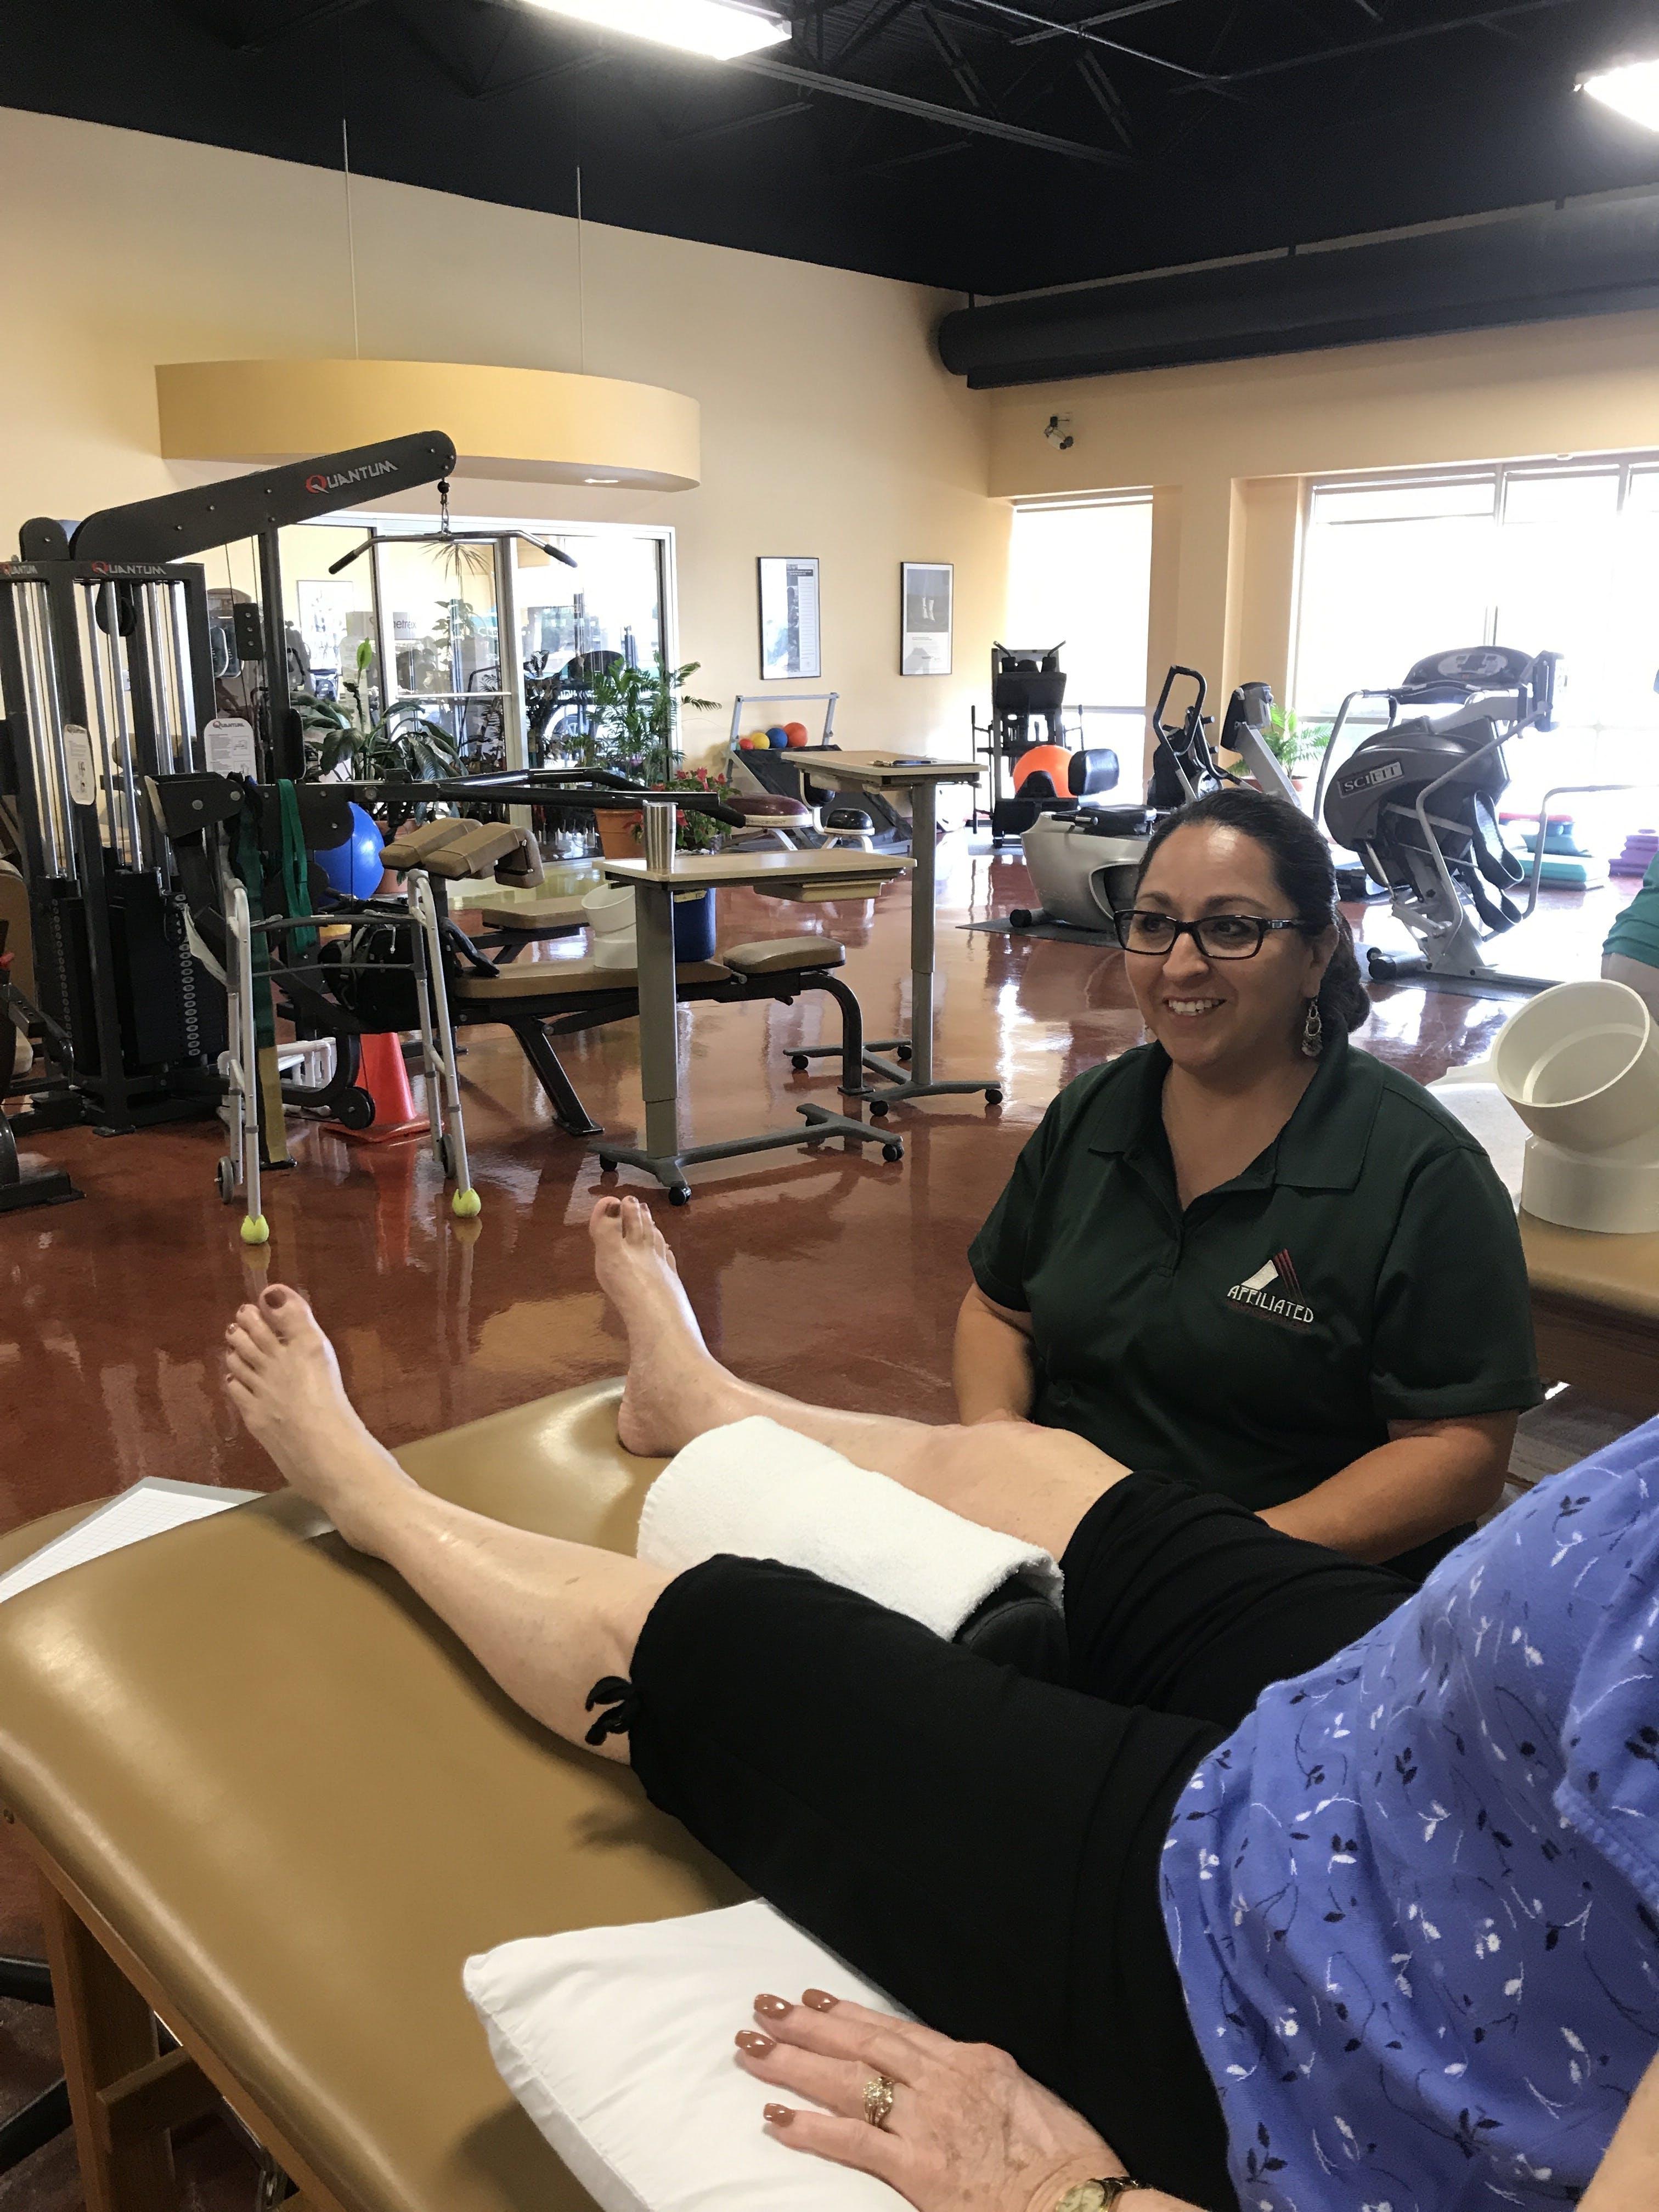 Corpus Christi Physical Therapist Affiliated